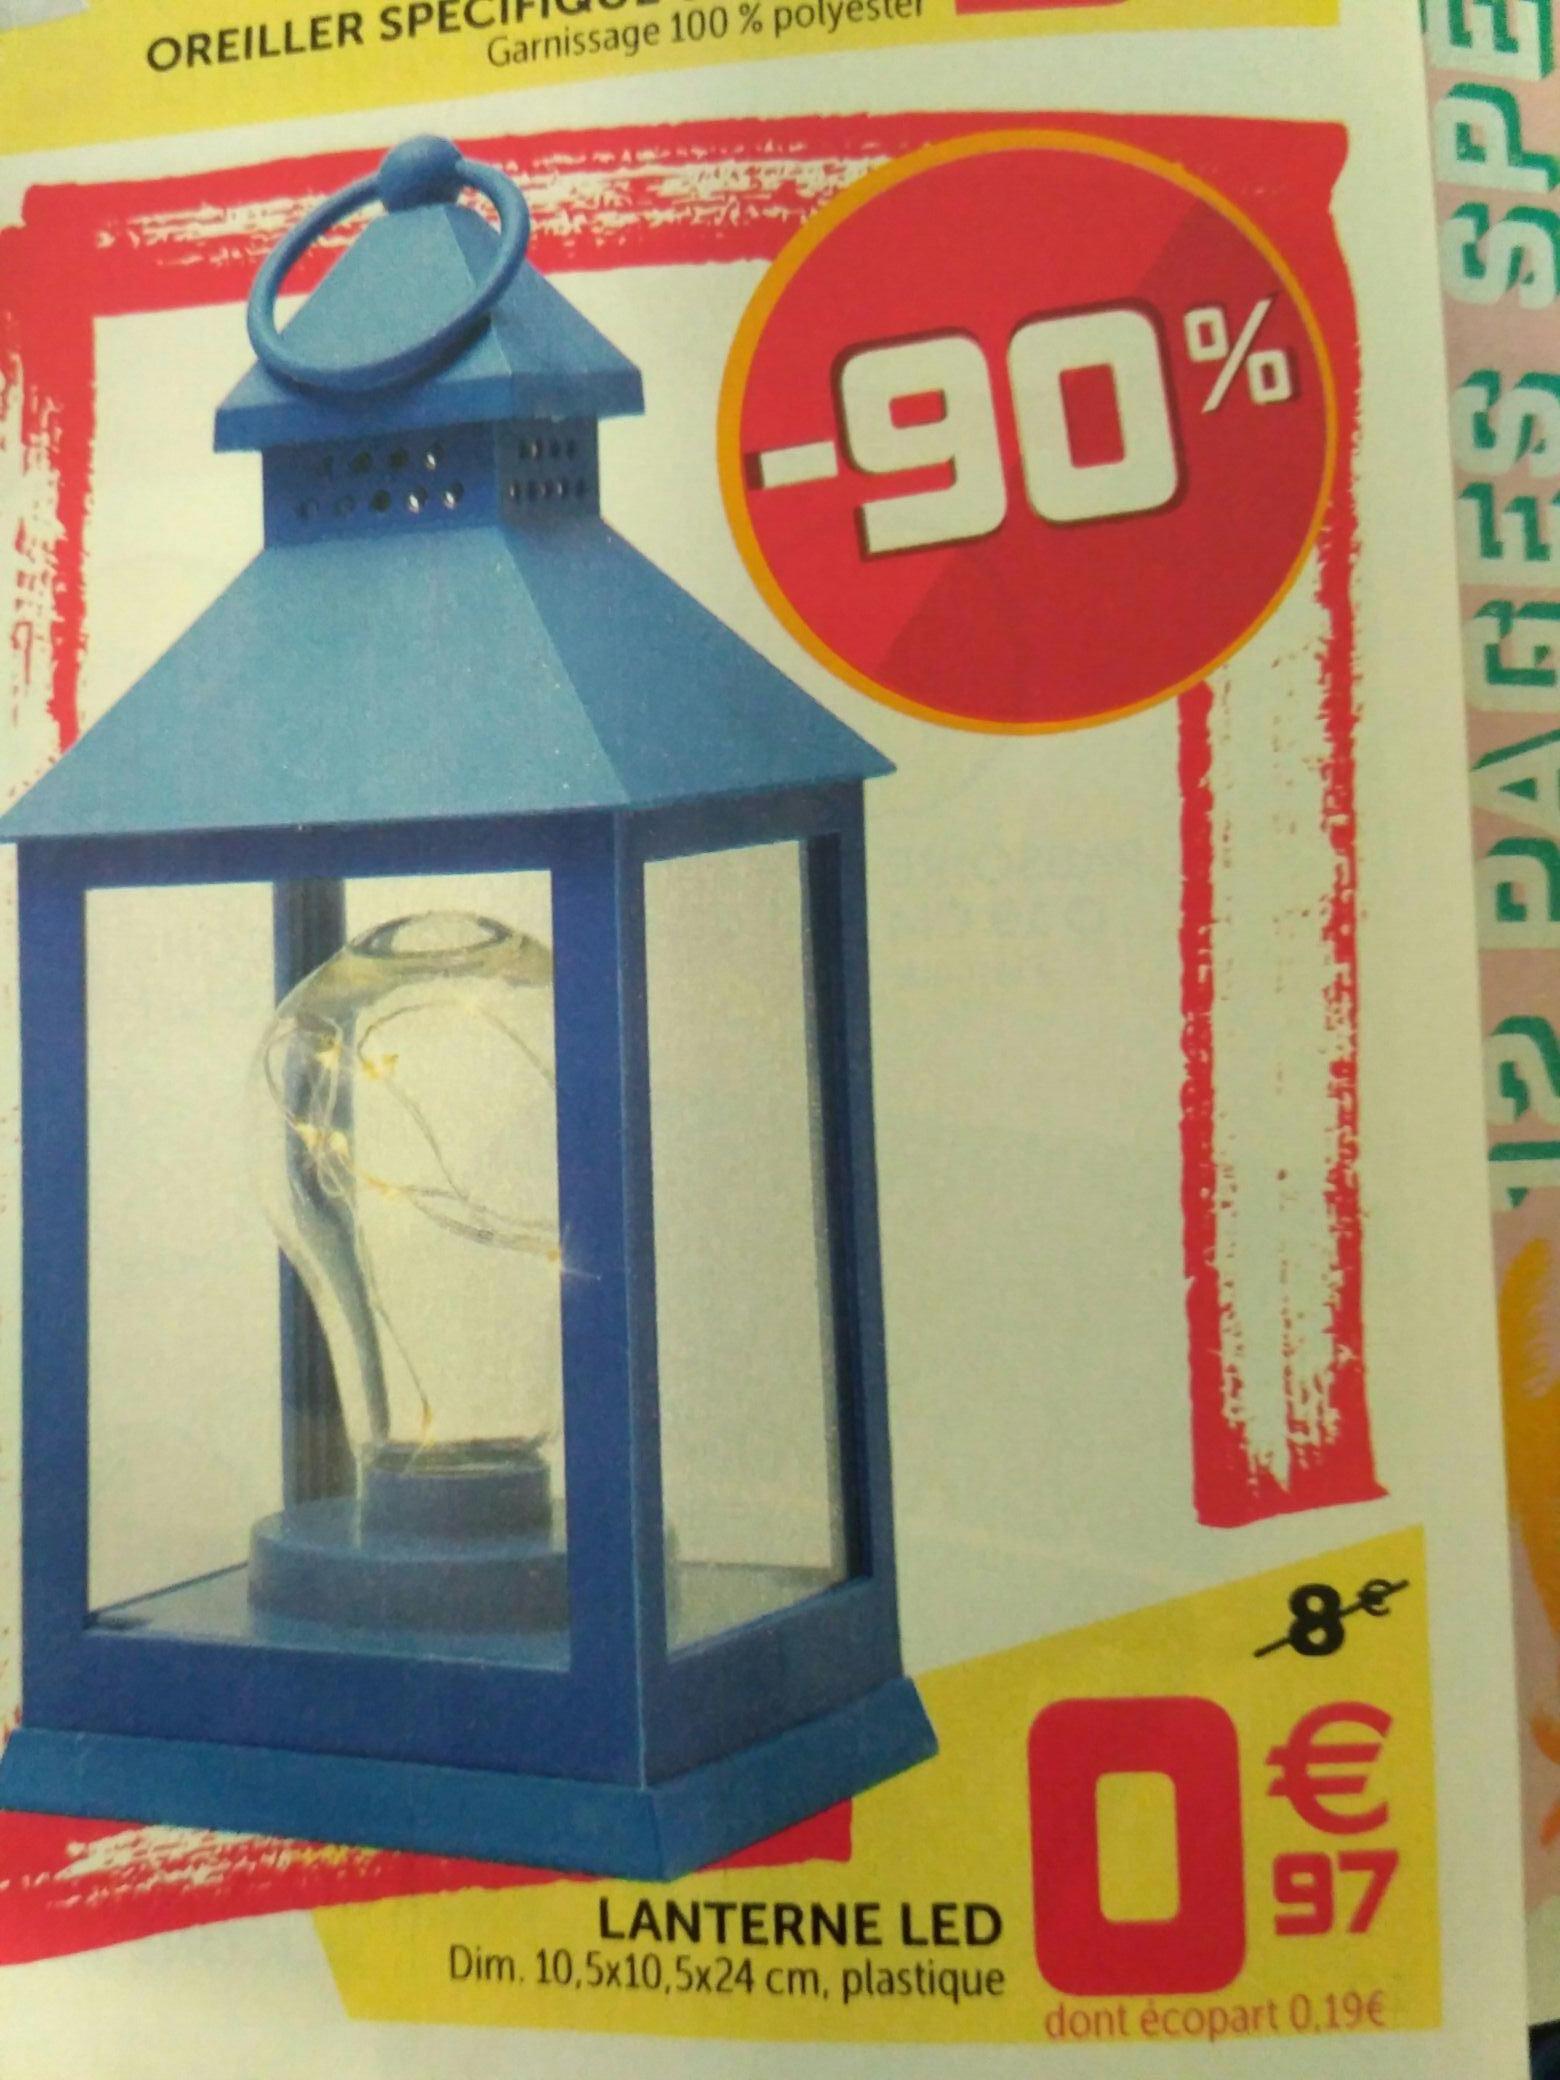 Lanterne LED en plastique